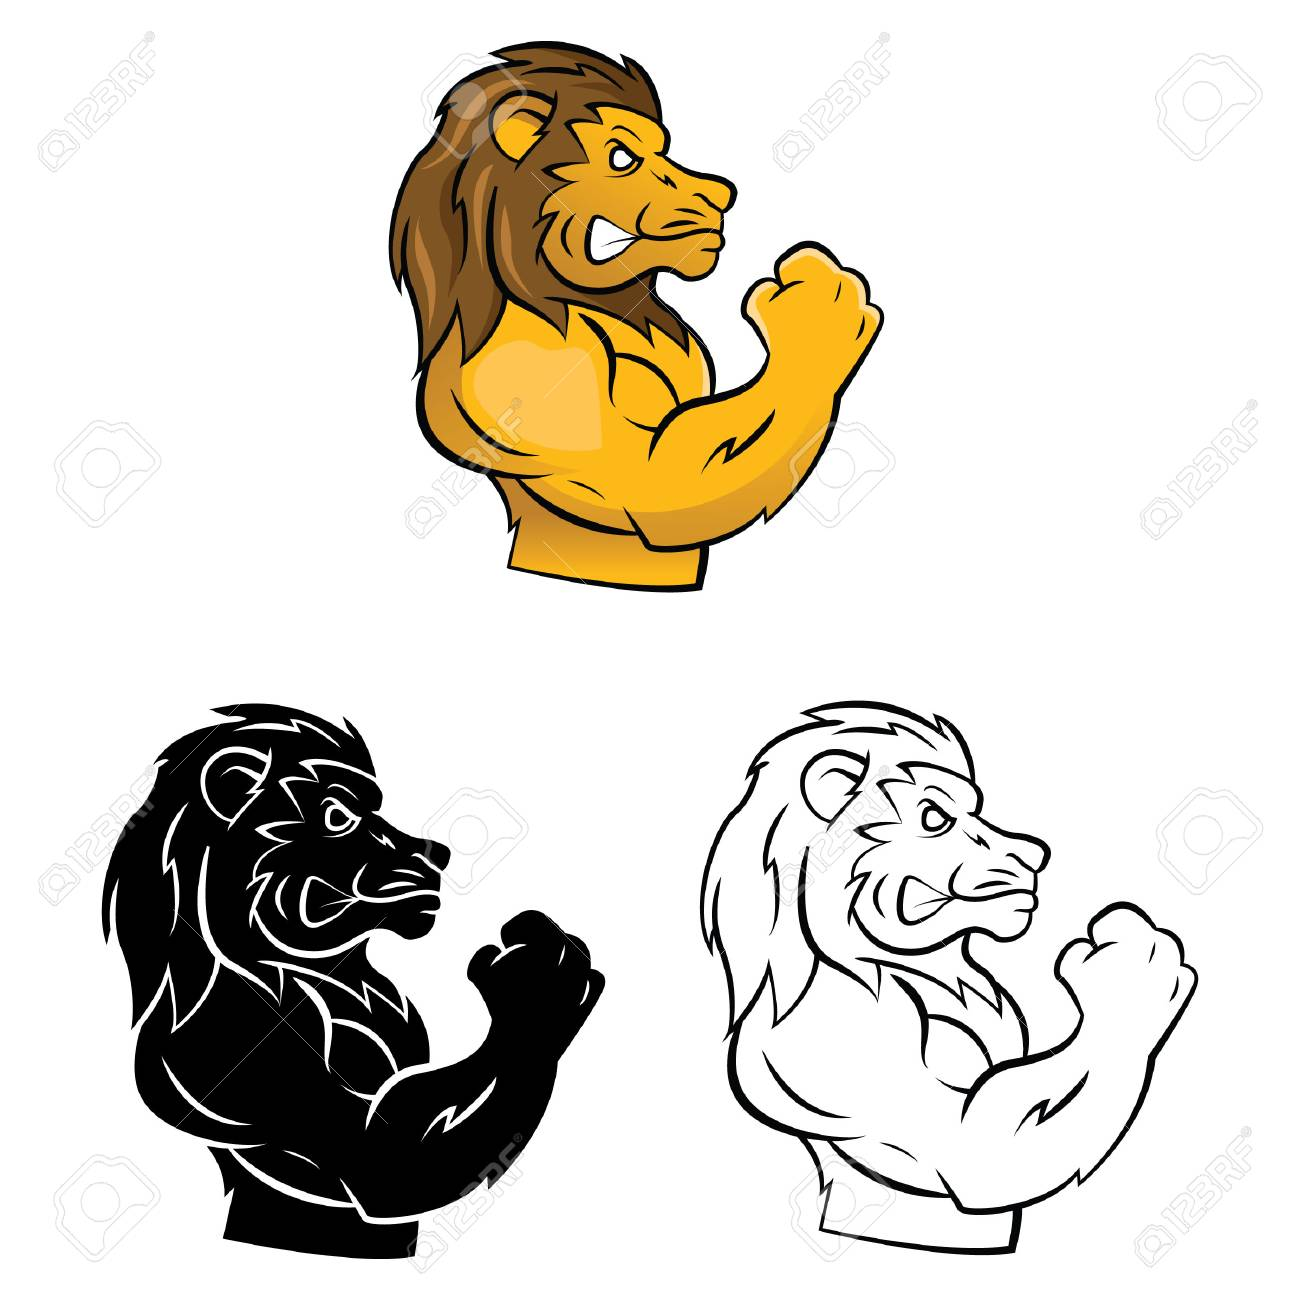 Coloring Book Lion Mascot Cartoon Character Vector Illustration